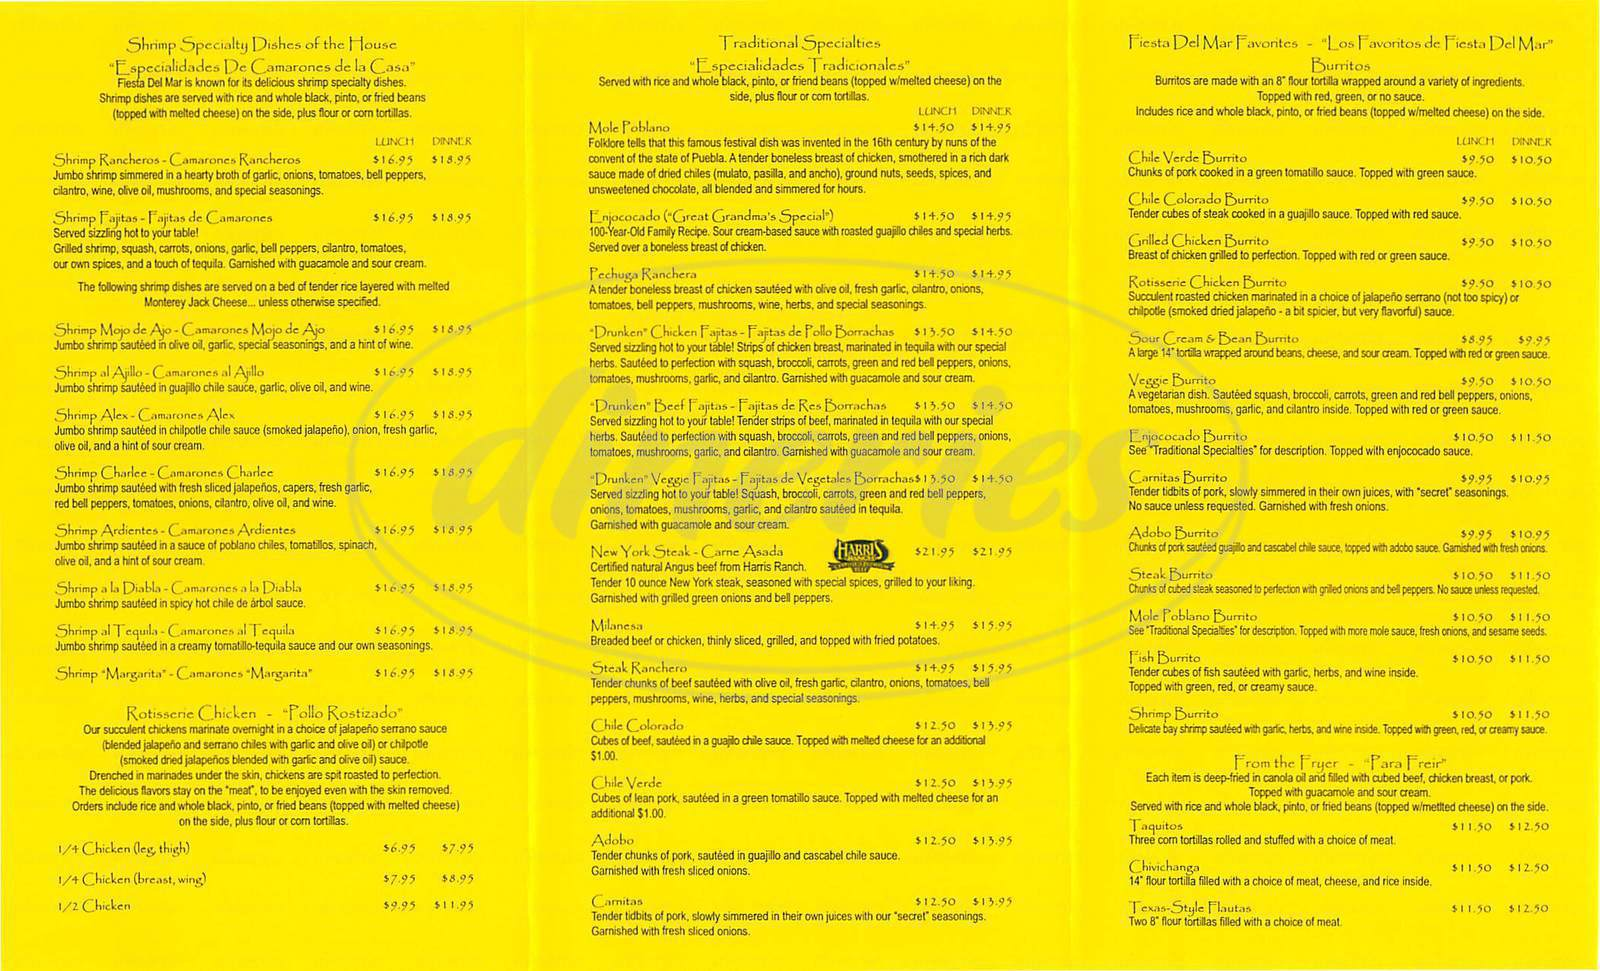 menu for Fiesta del Mar Too